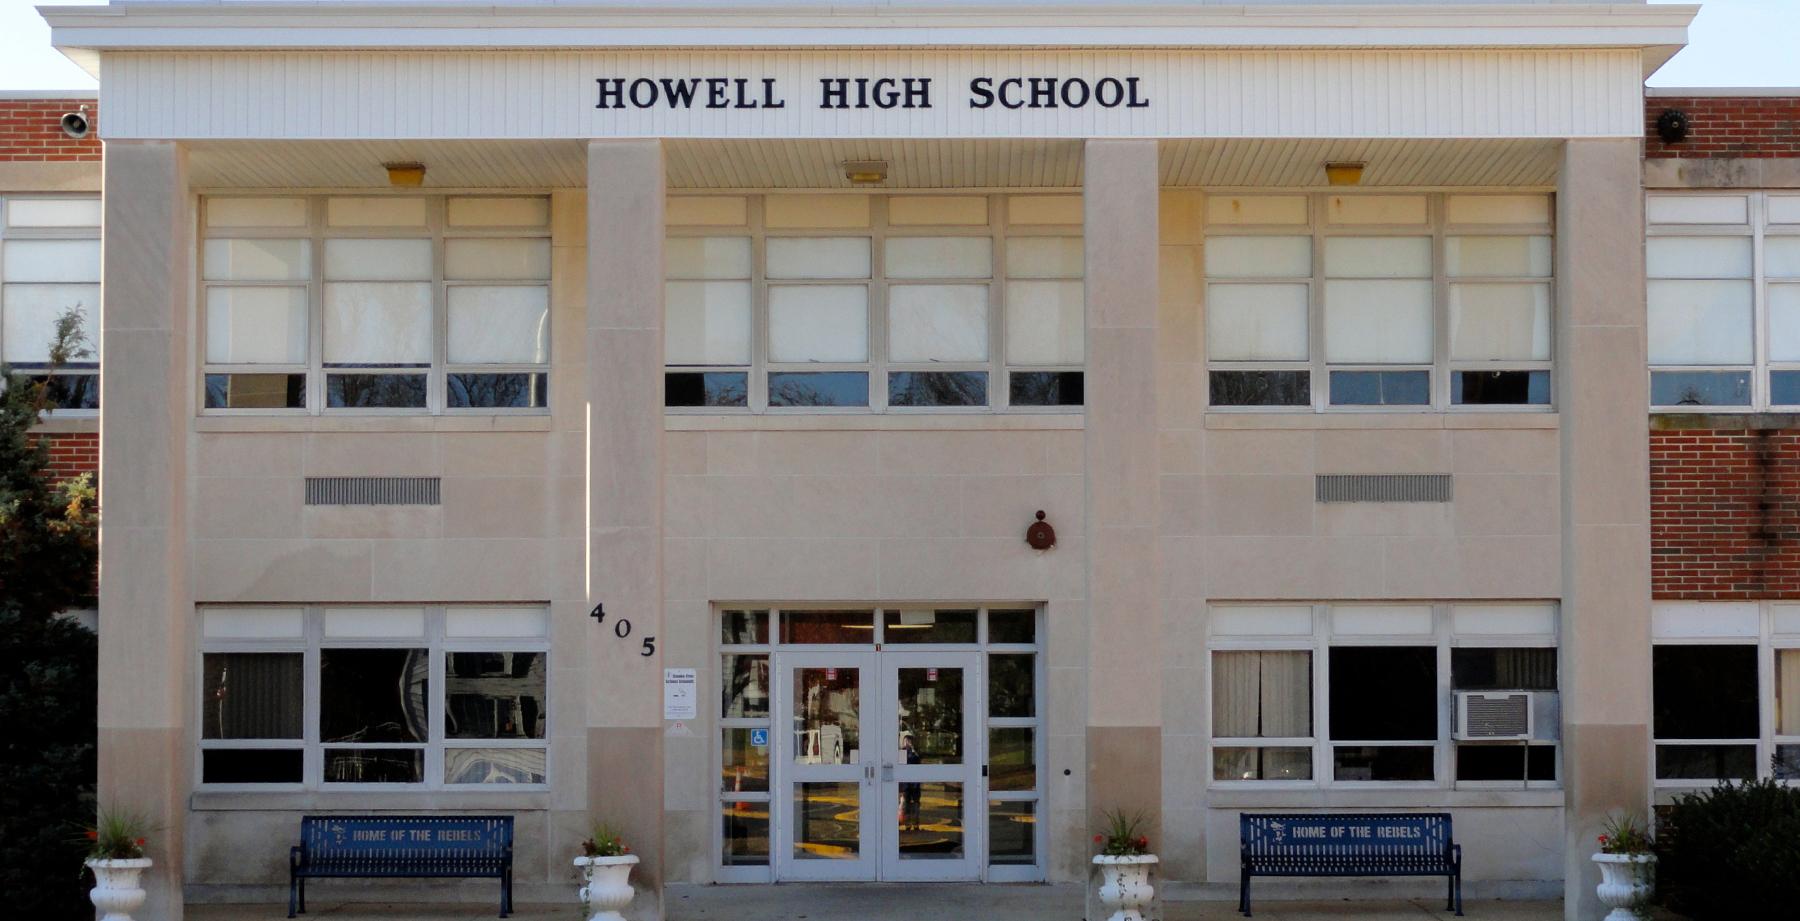 The 2020 Howell High School – Freshmen Campus Virtual Food Drive